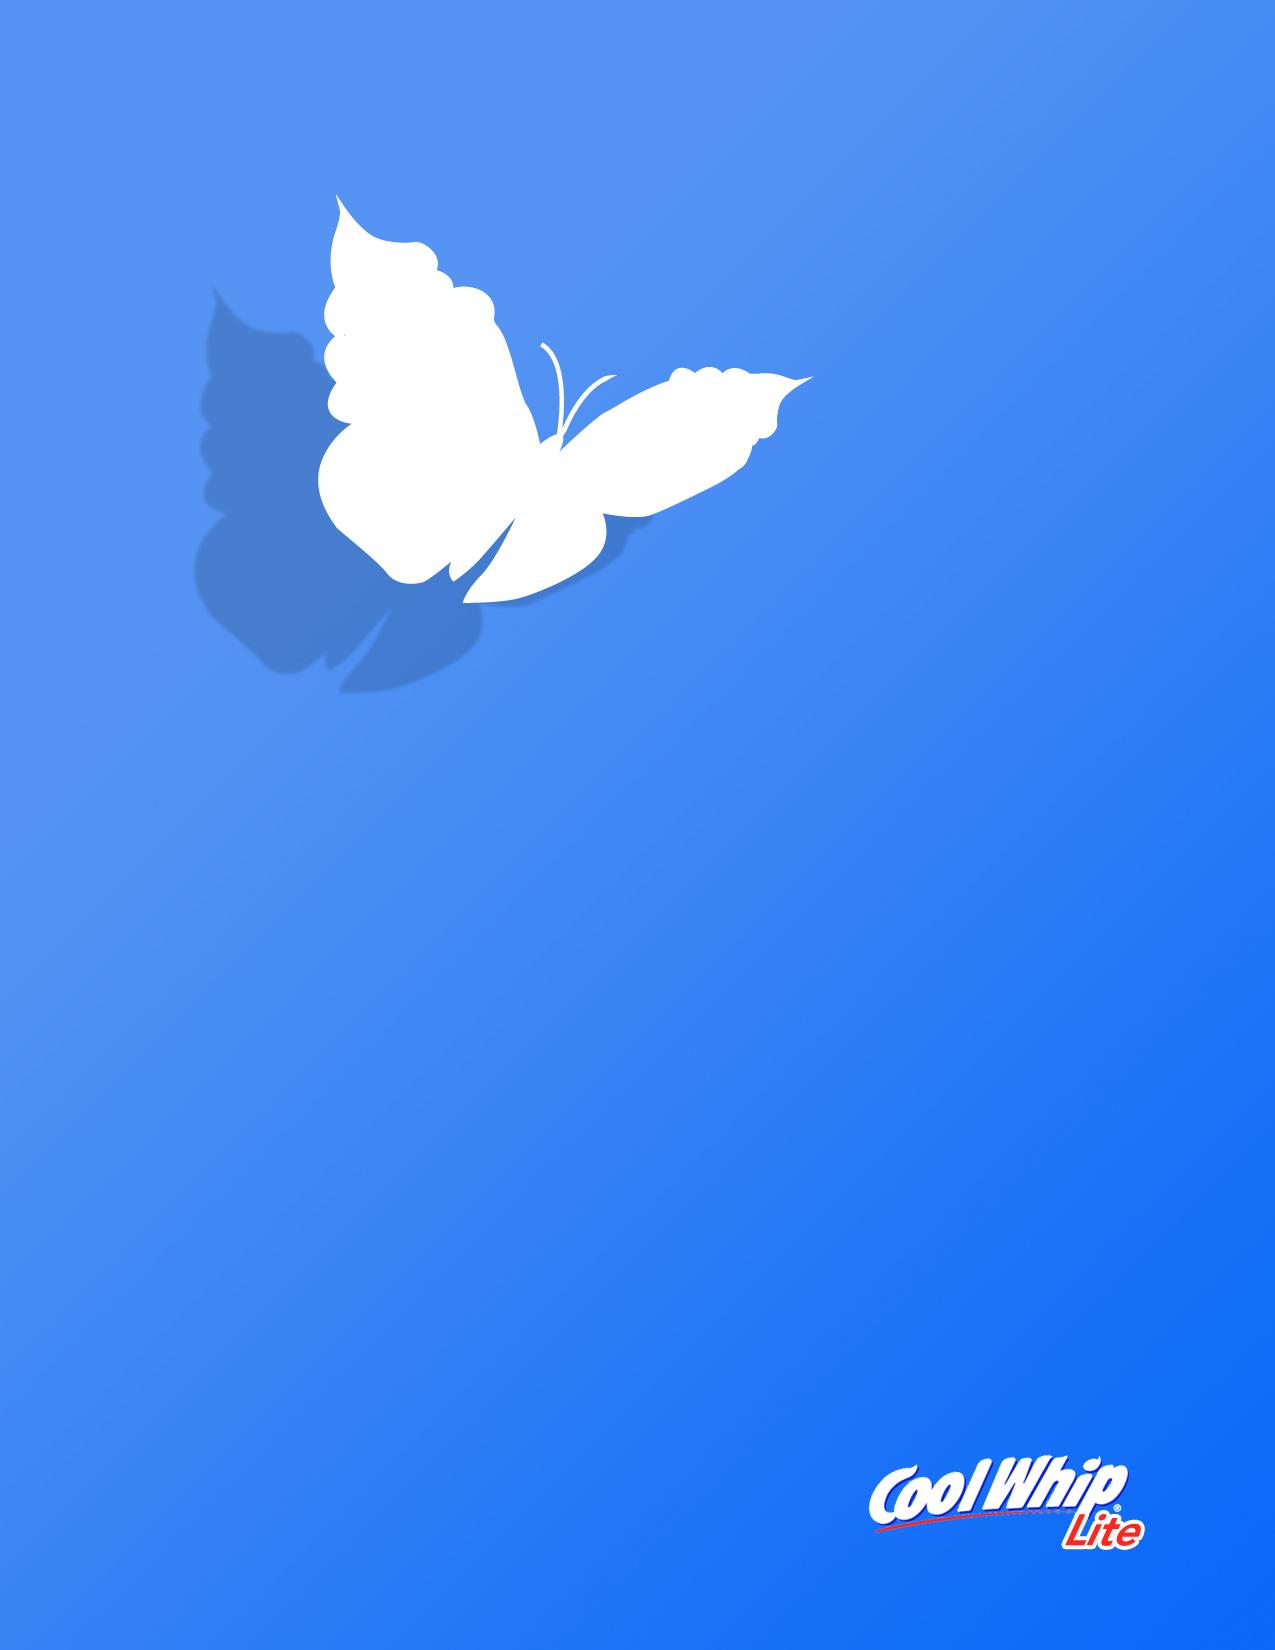 CoolWhip_butterfly.jpg